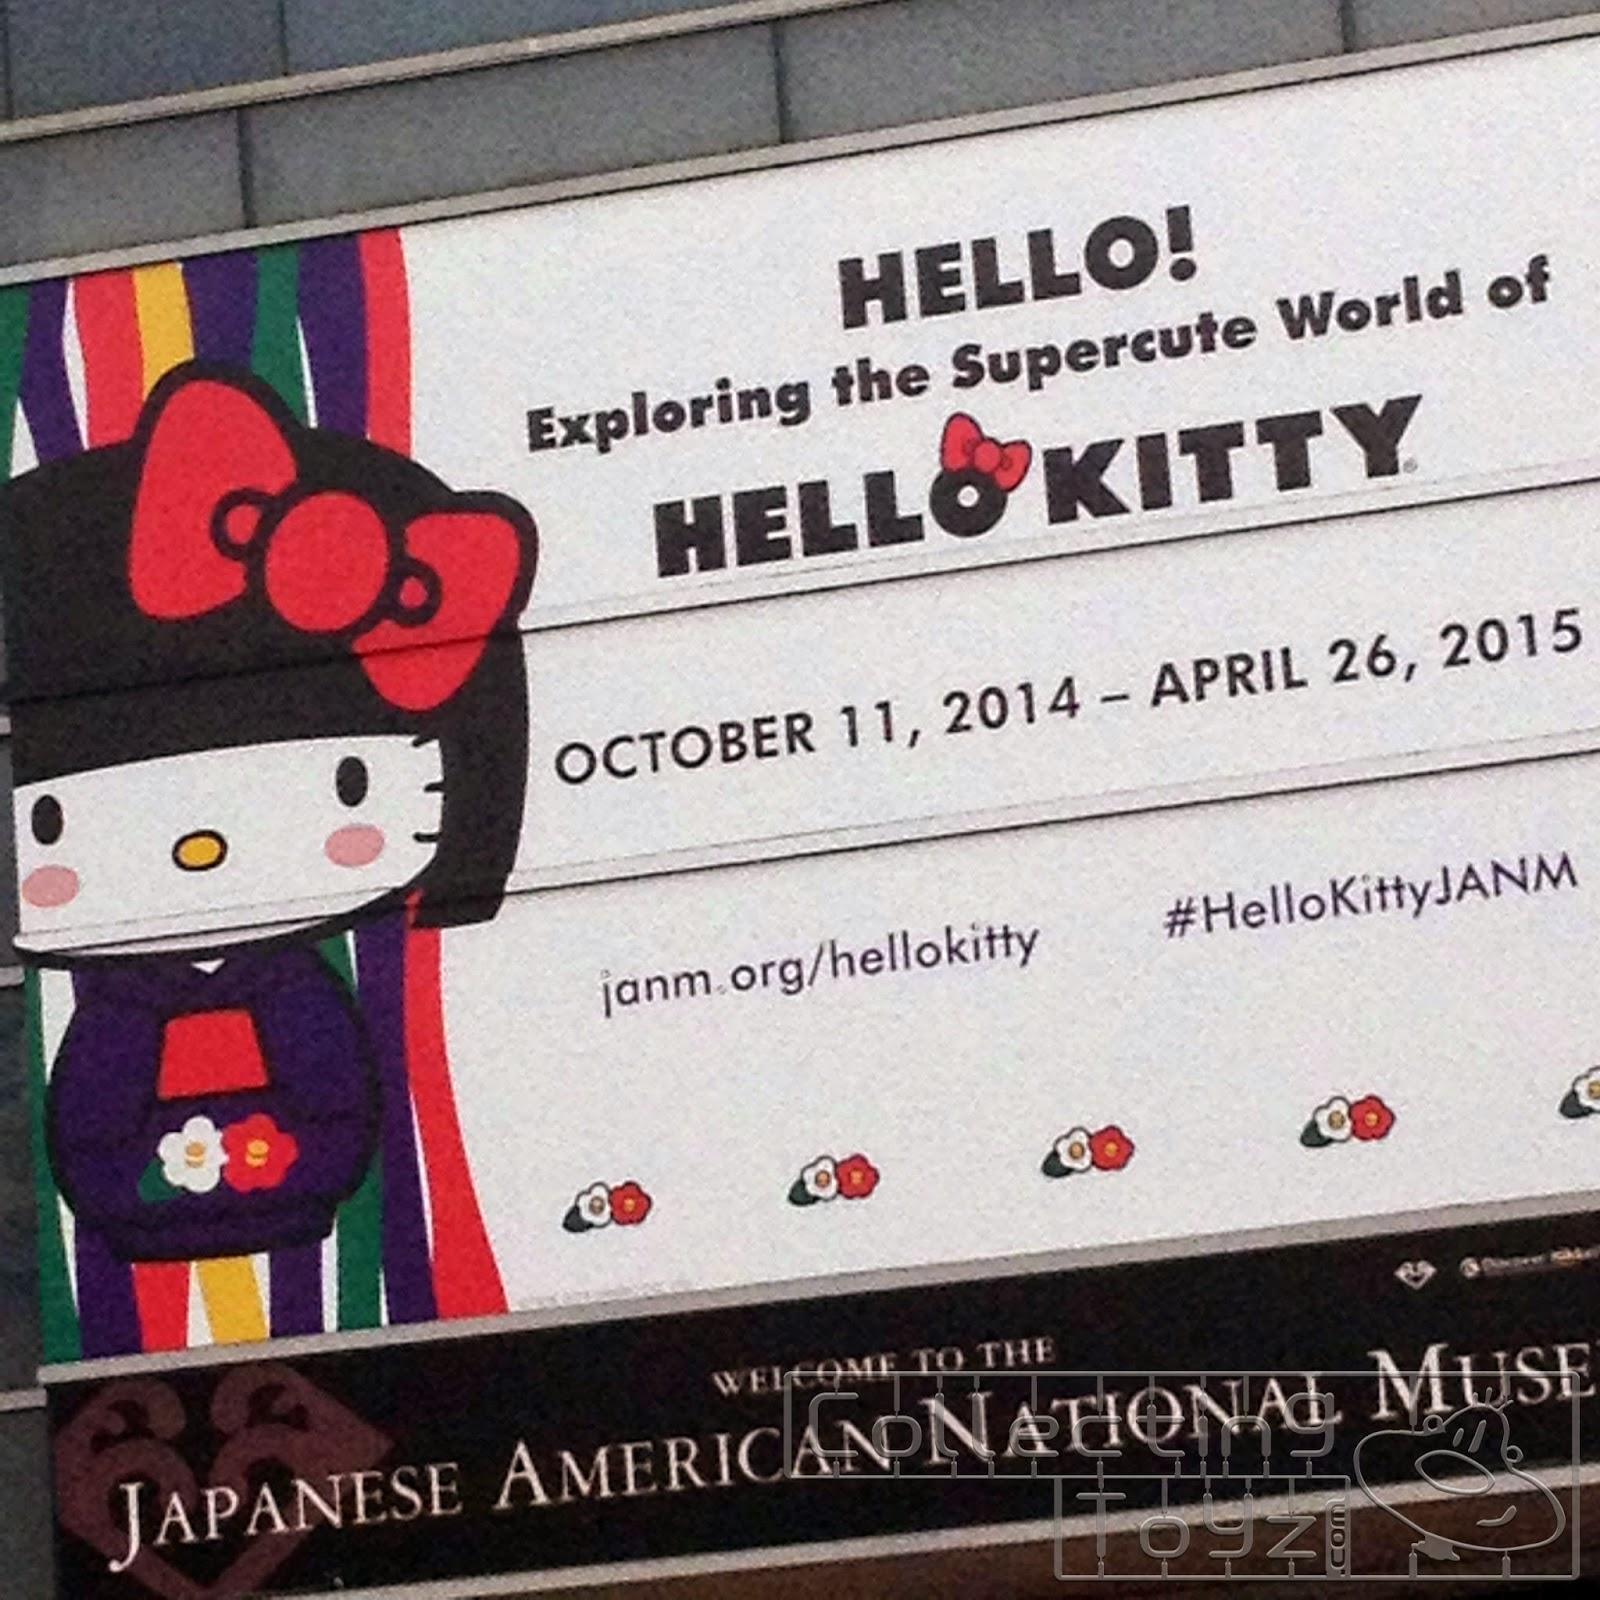 9f40b6a13c16 Collecting Toyz  HELLO! Exploring the Supercute World of Hello Kitty ...